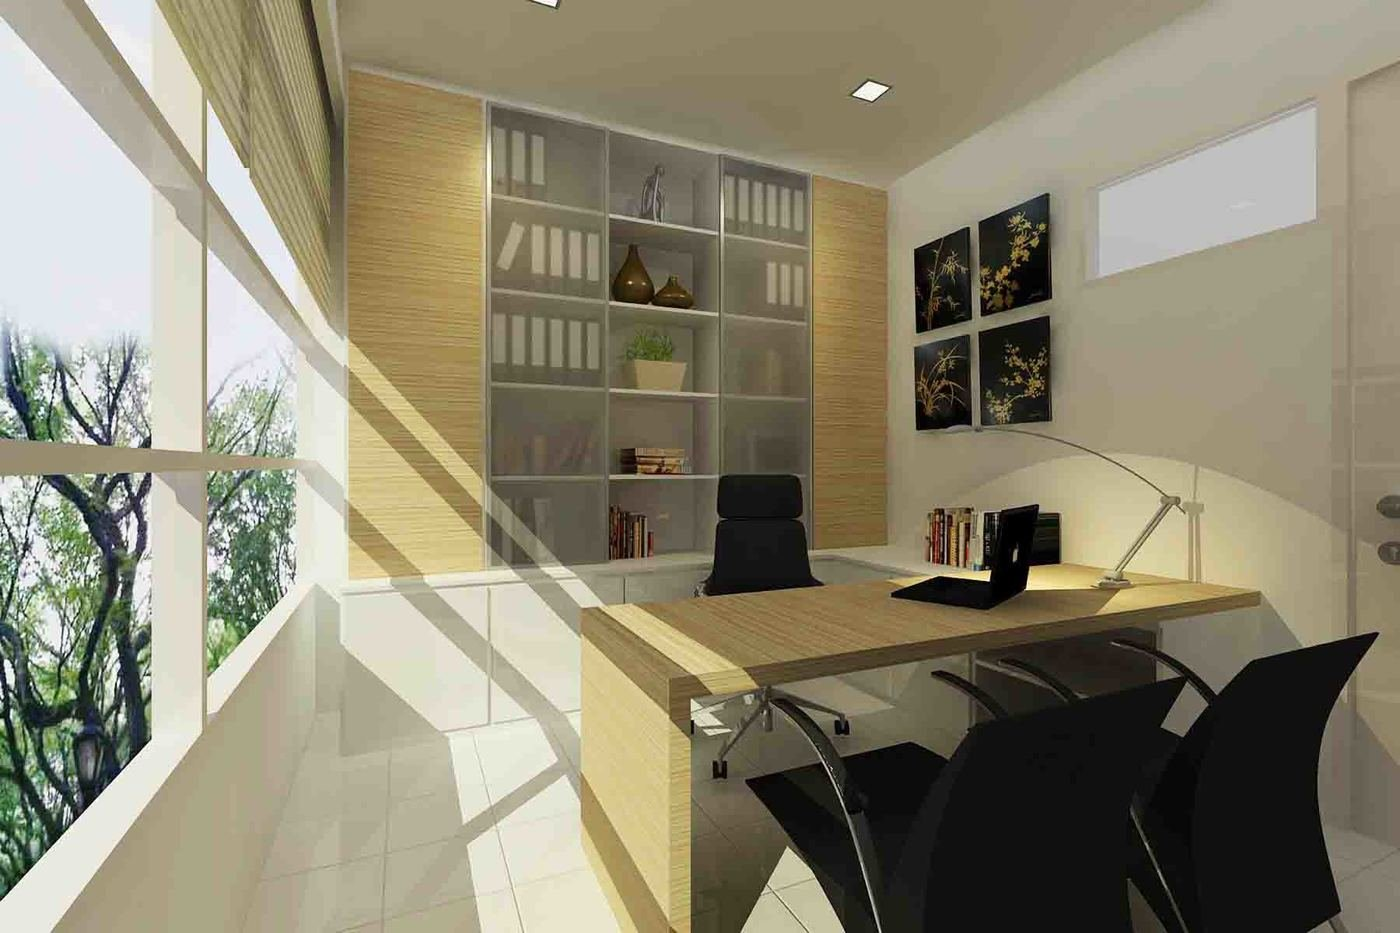 Mdc school design surabaya by fesia prawirya at for Design interior surabaya